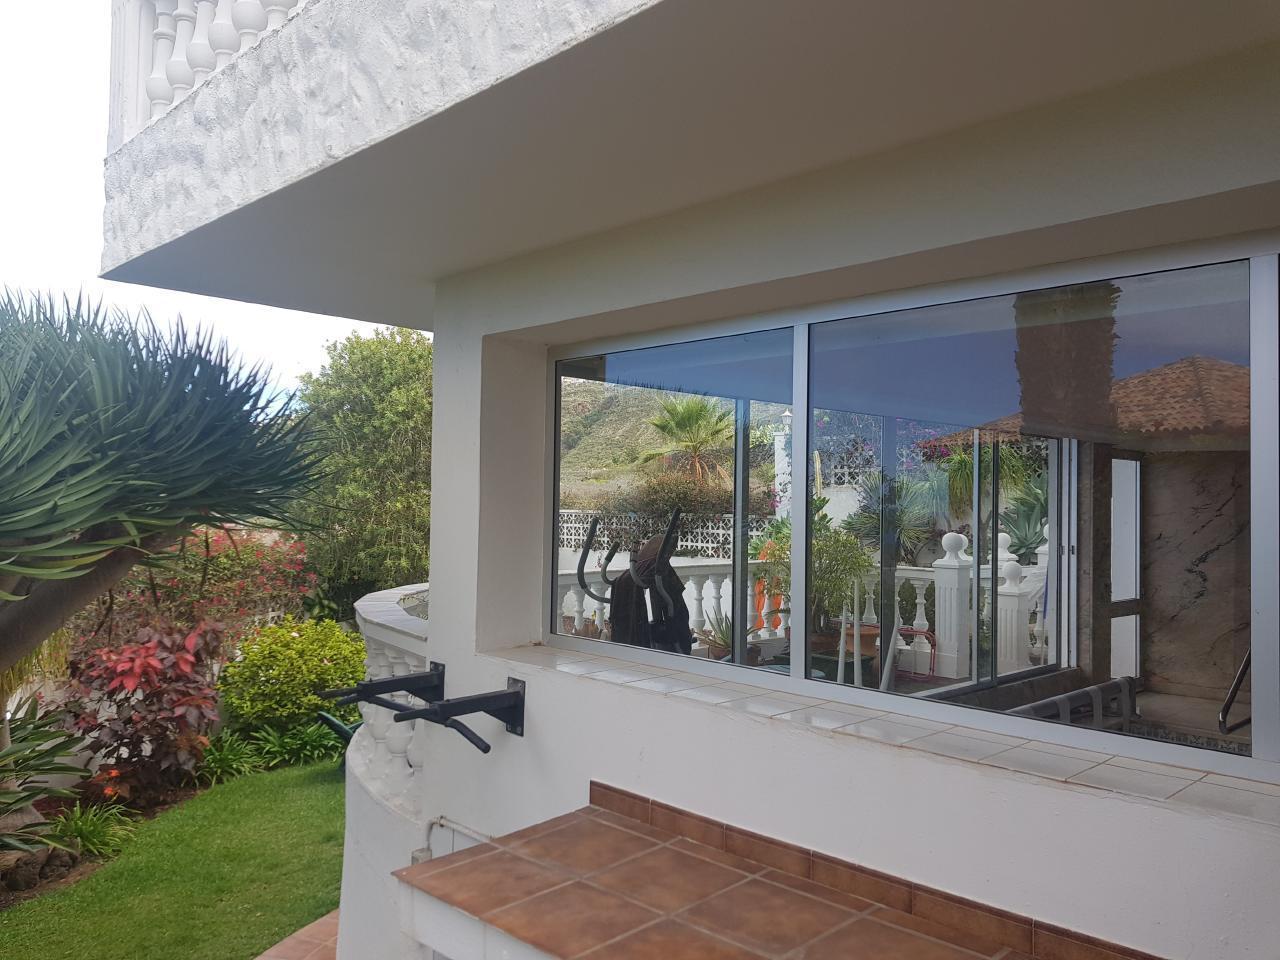 Appartement de vacances Villa Larnia Familien Apartment   * Urlaub für Körper, Geist und Seele * (2529406), El Sauzal, Ténérife, Iles Canaries, Espagne, image 15